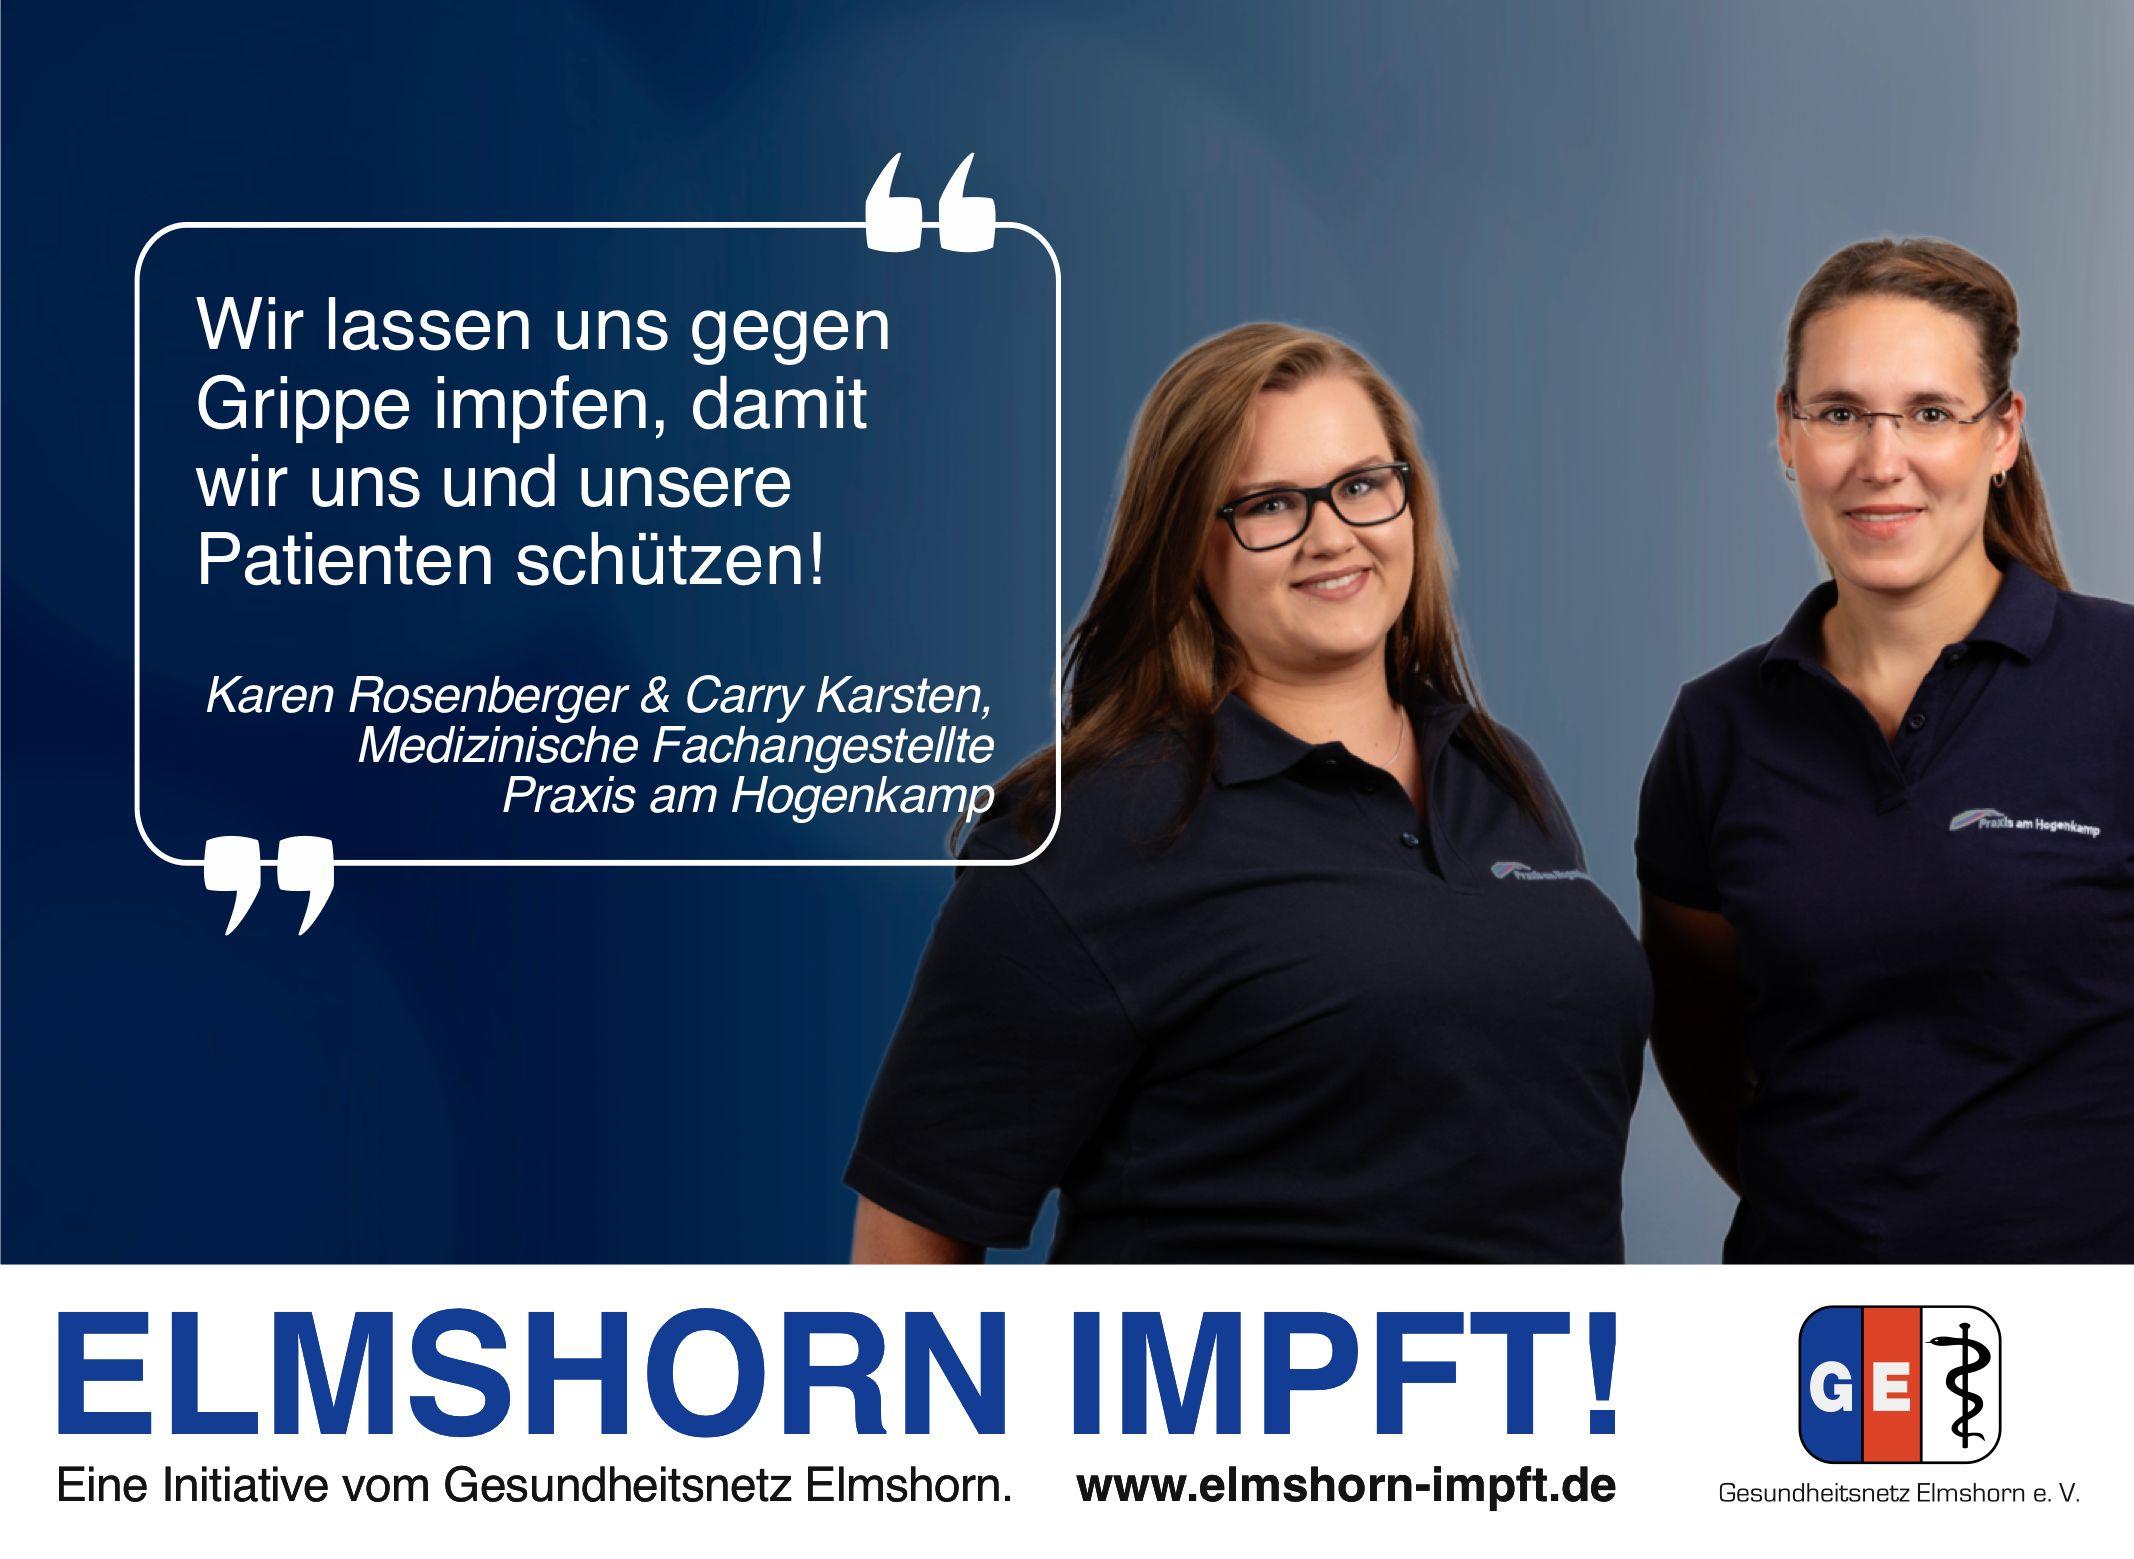 Elmshorn impft Testimonial - Praxis am Hogenkamp